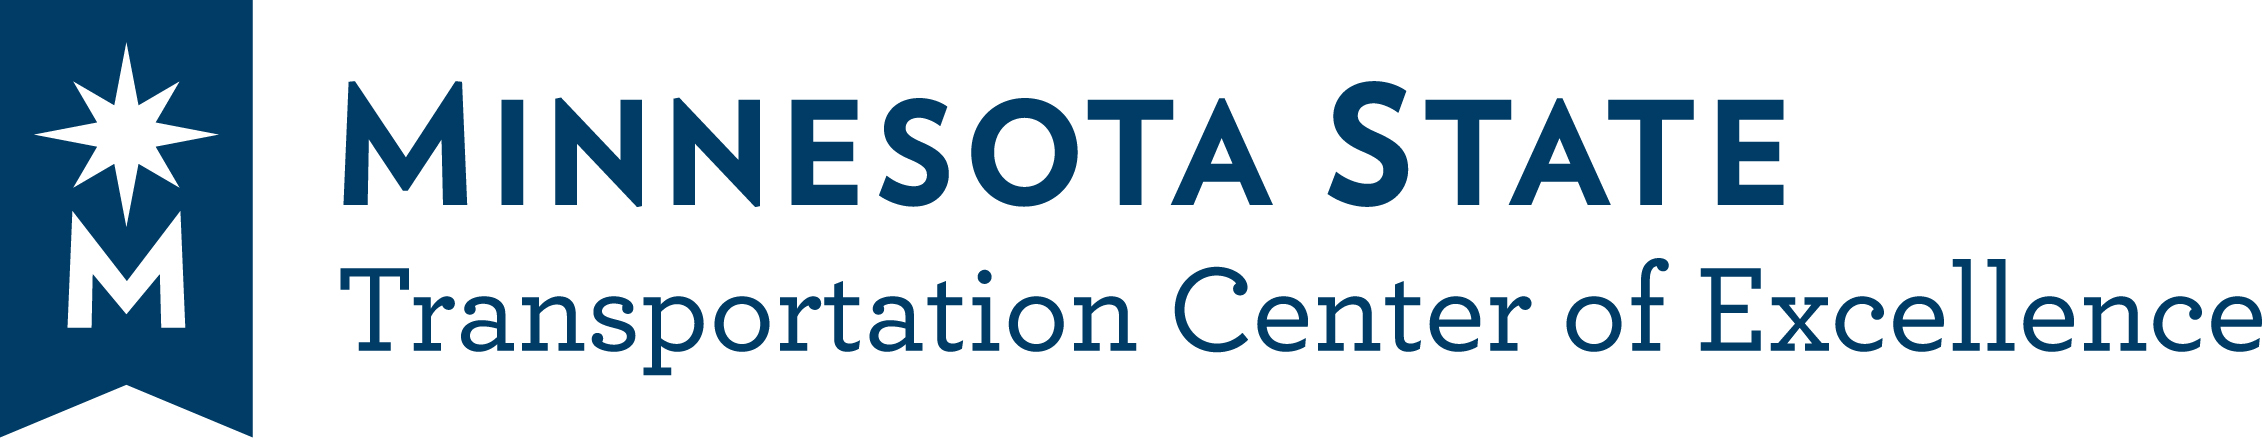 Minnesota State Transportation Center of Excellence Logo